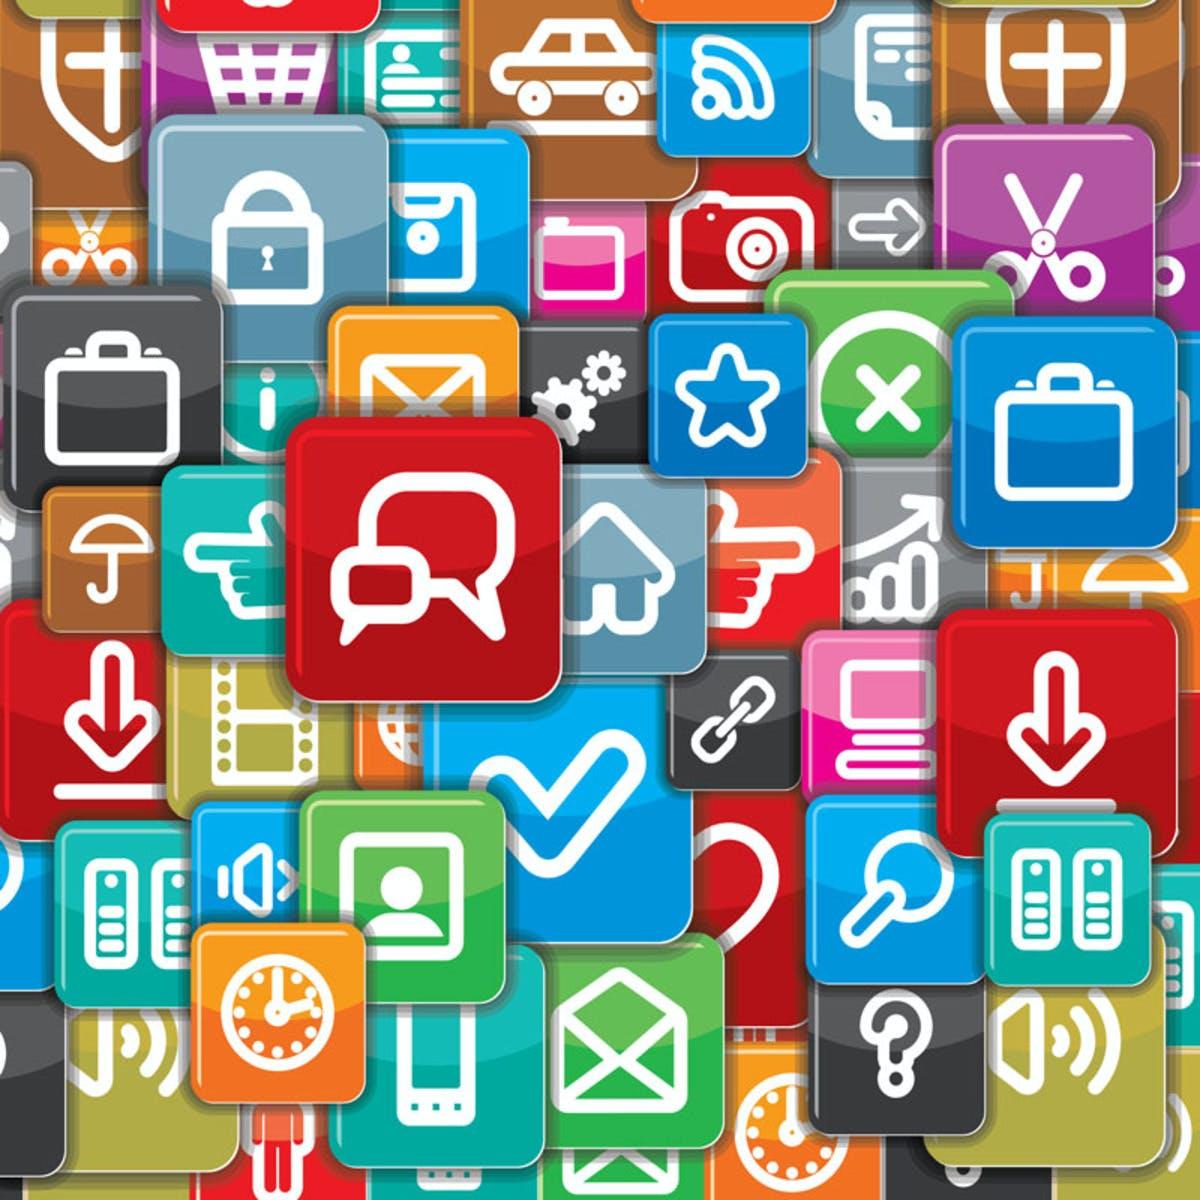 Games, Sensors and Media